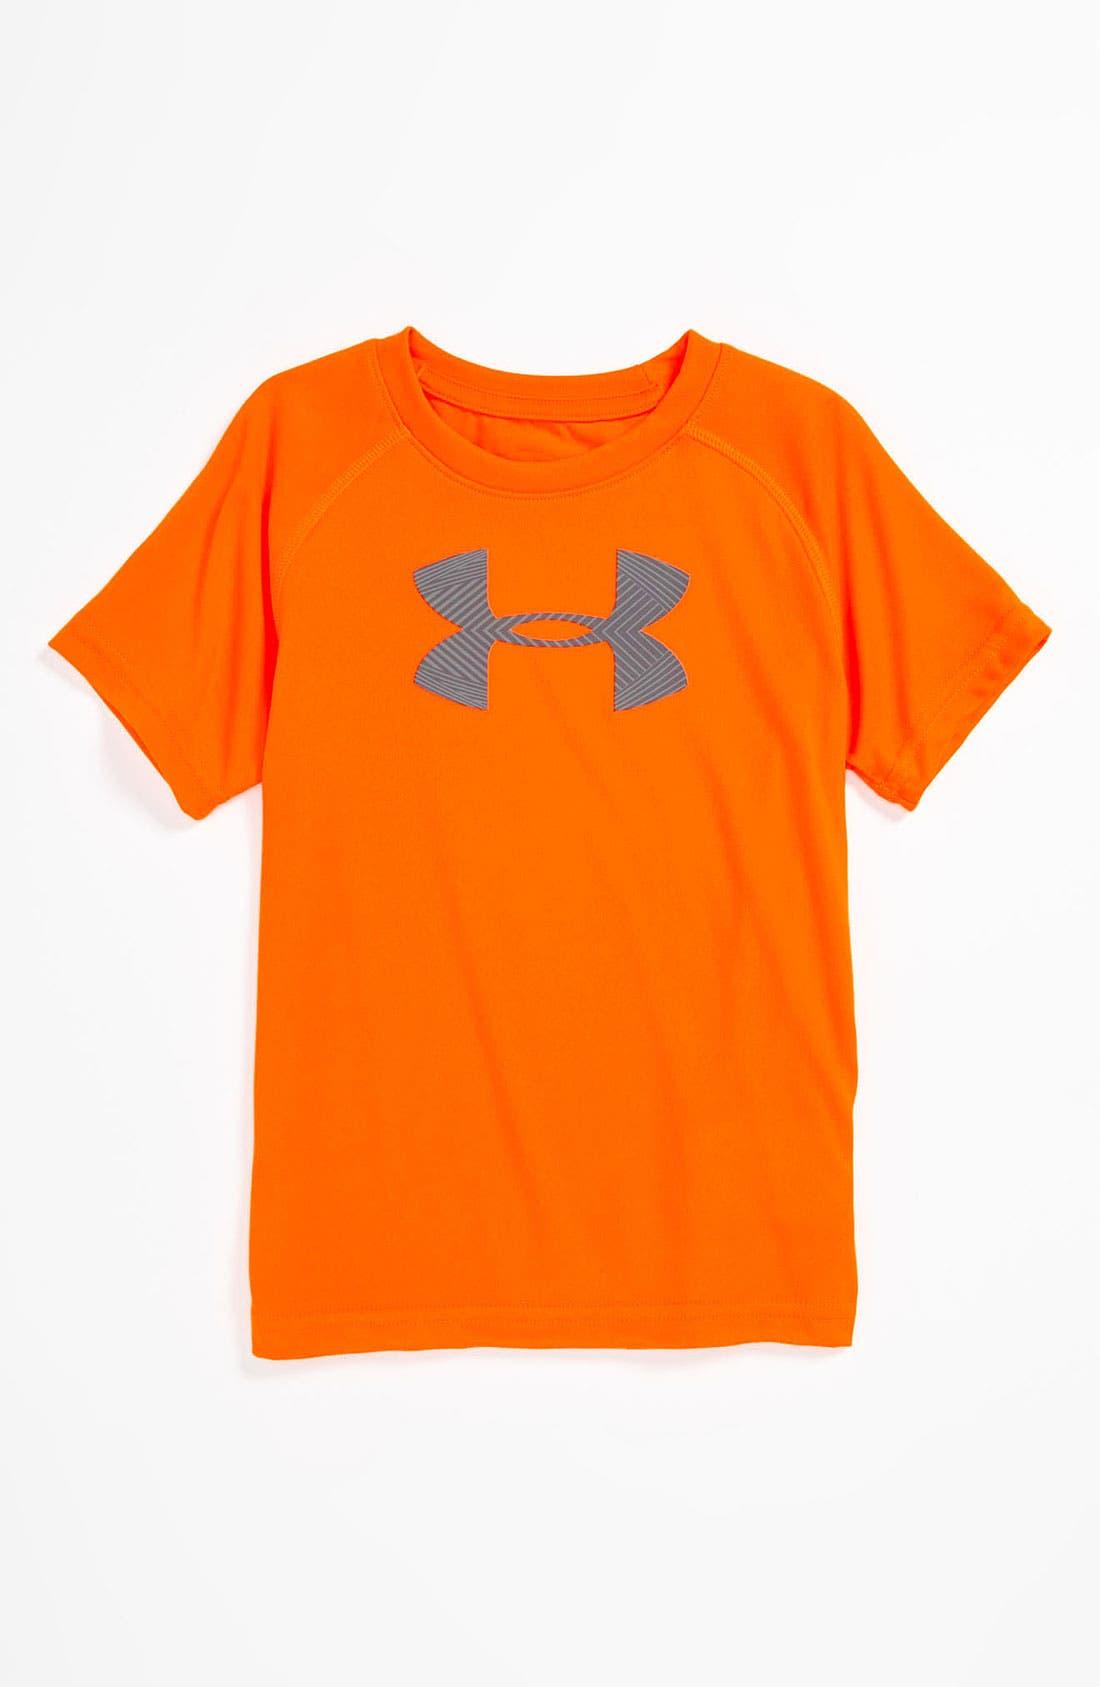 Alternate Image 1 Selected - Under Armour HeatGear® T-Shirt (Little Boys)